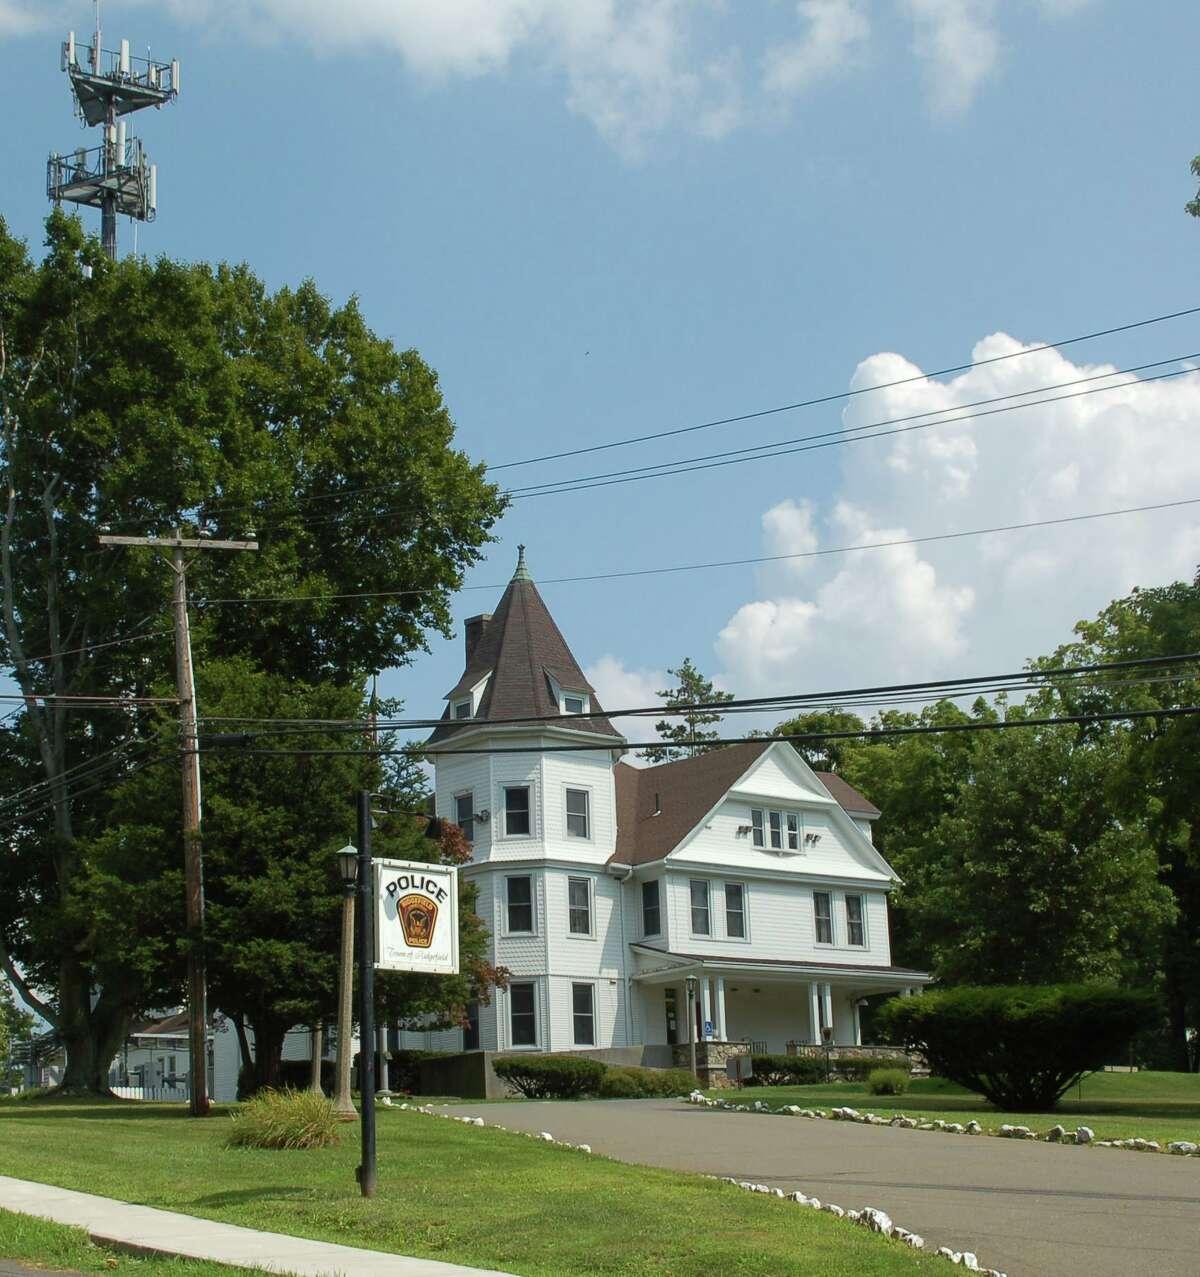 Ridgefield's Police Station